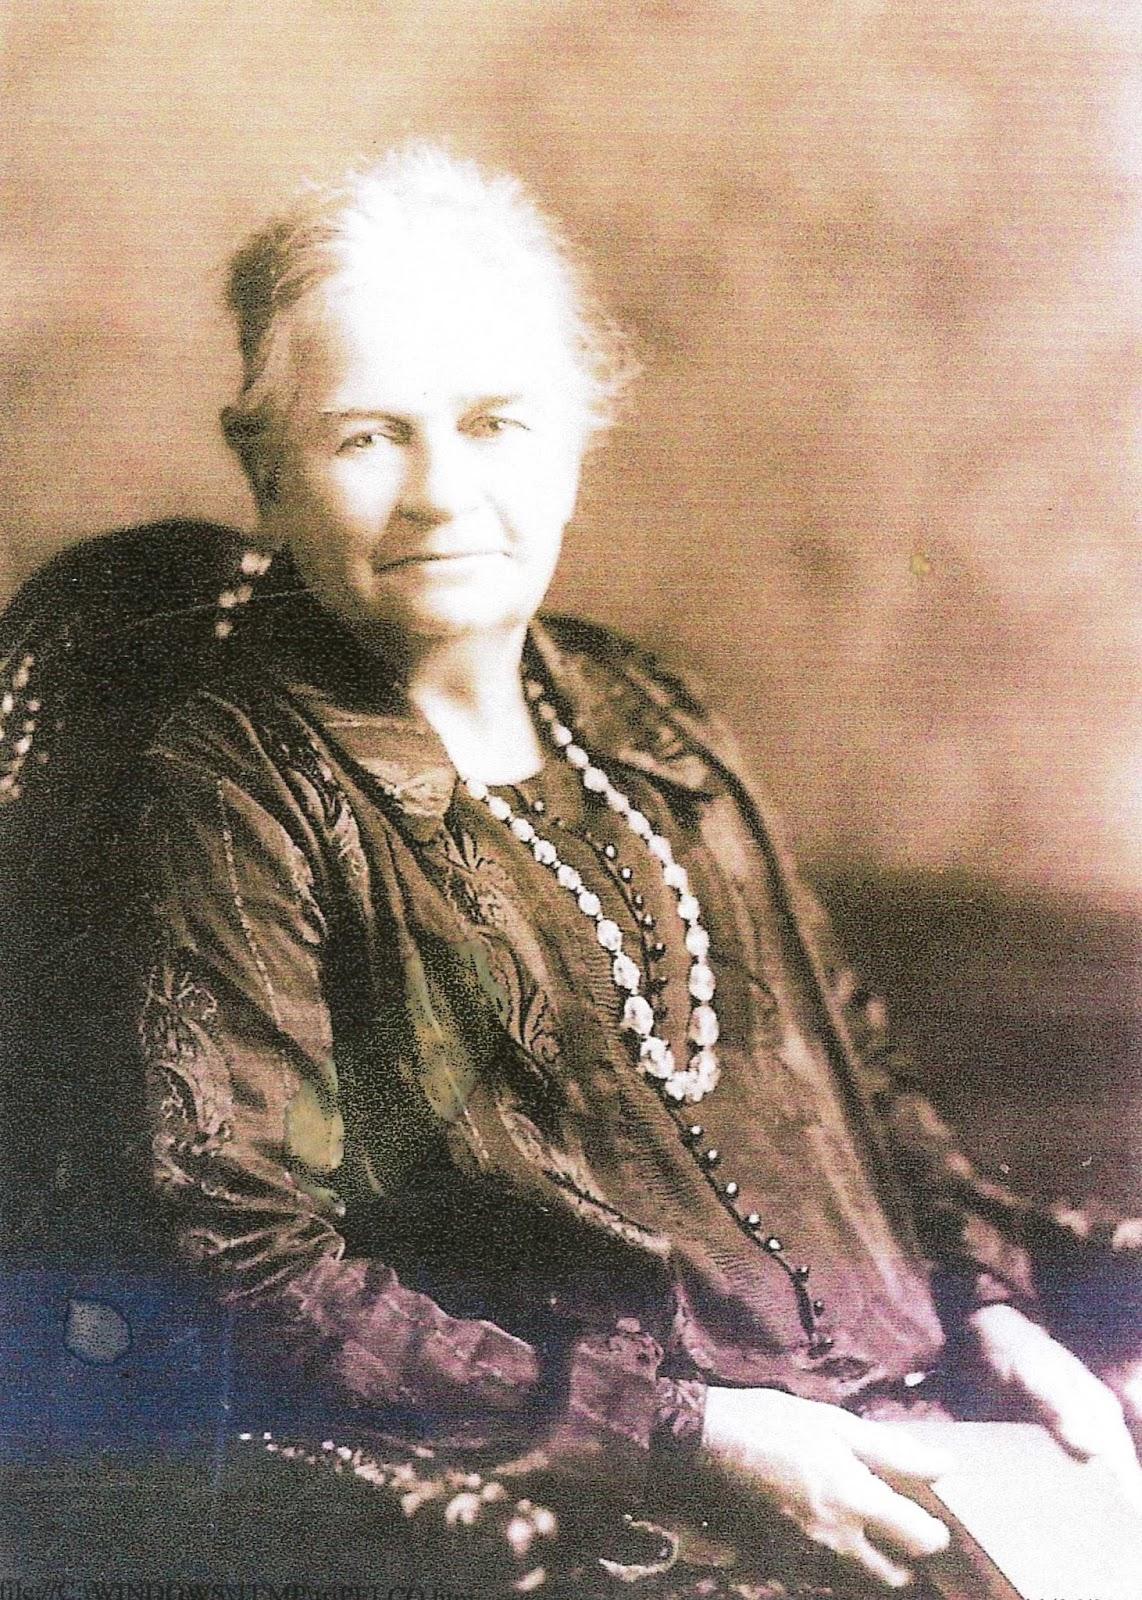 Mary Dibley